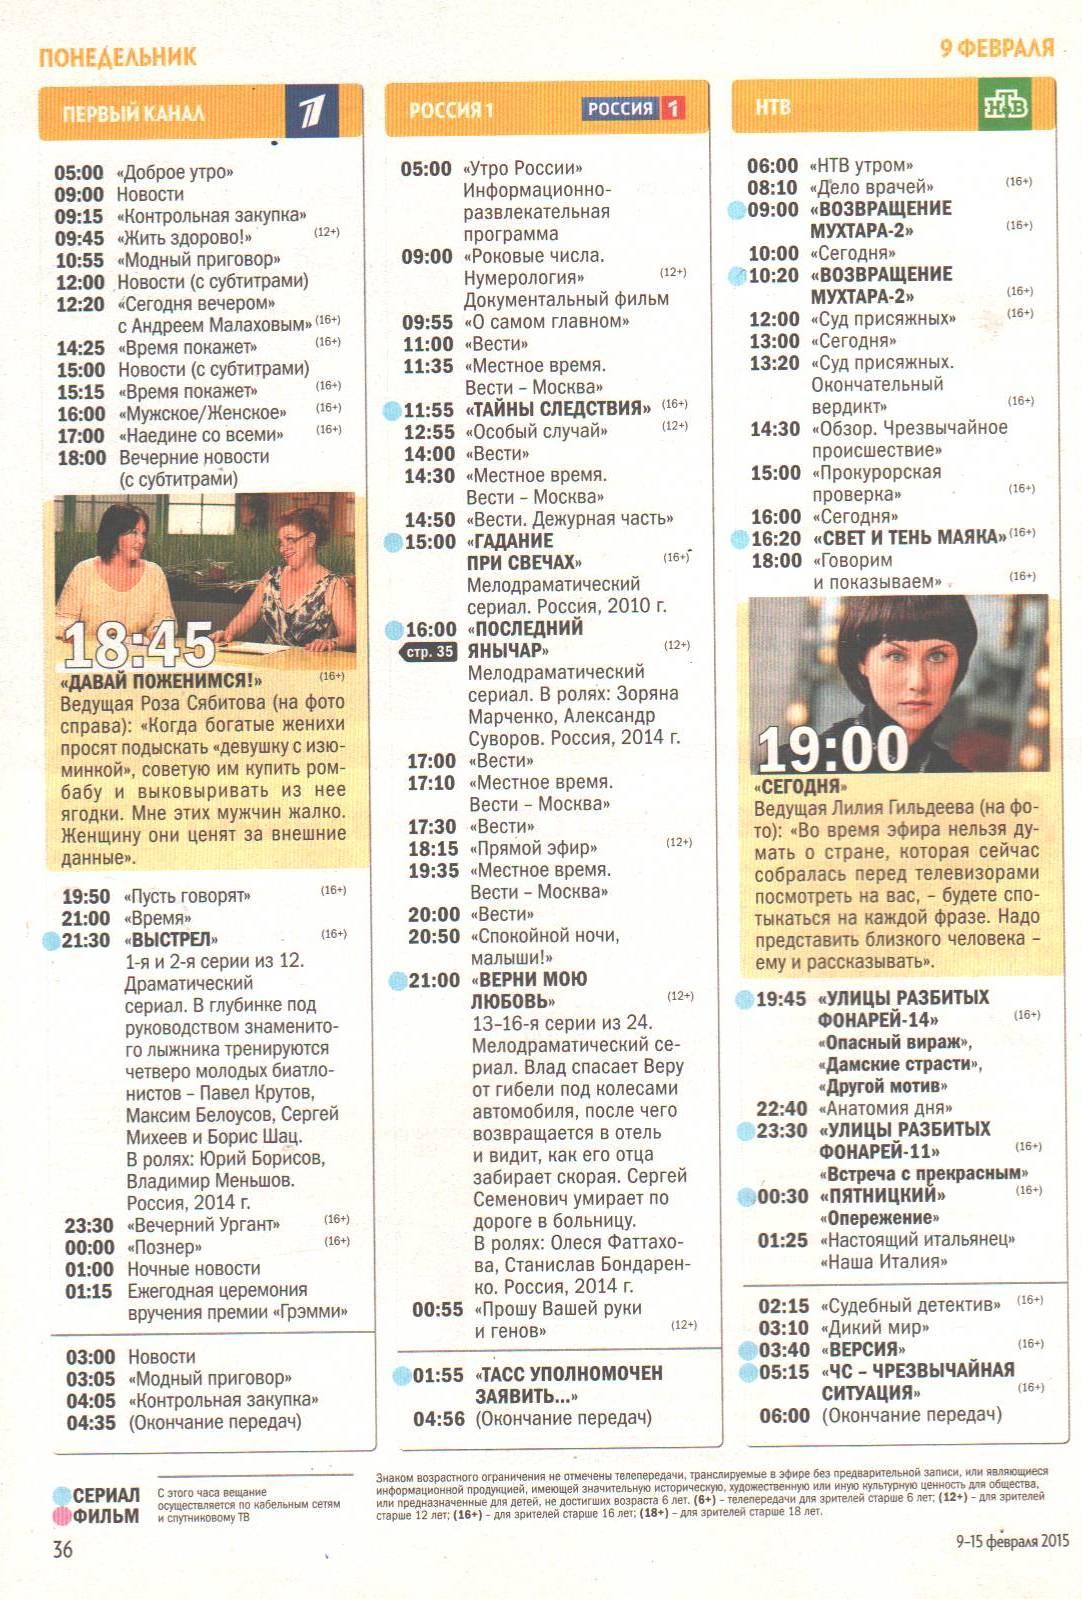 телепрограмма на россии 1